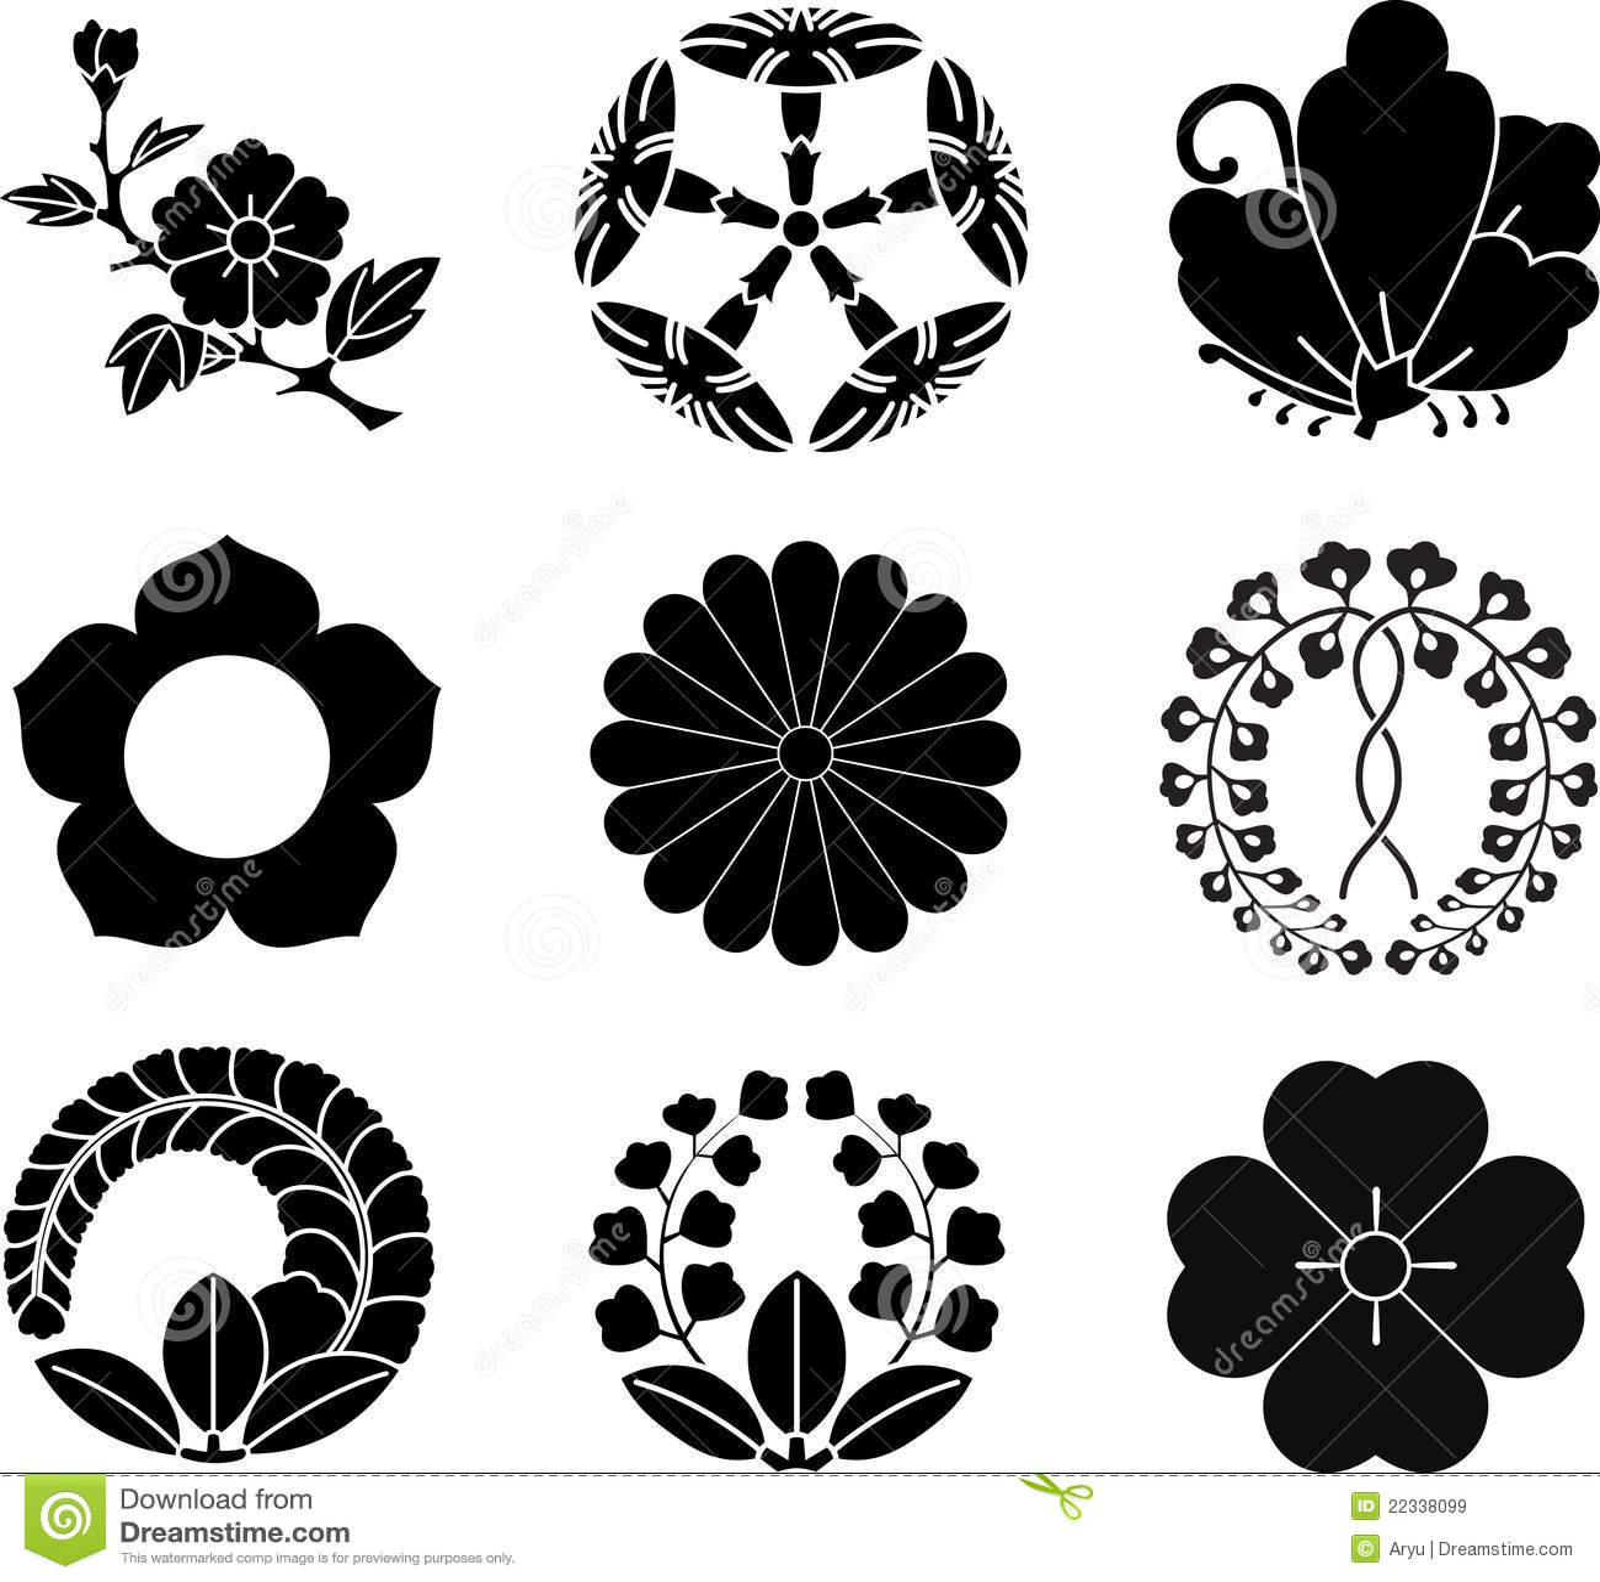 Httpthumbsdreamstimezjapanese family crests 22338099g explore japanese flowers family crest and more biocorpaavc Gallery